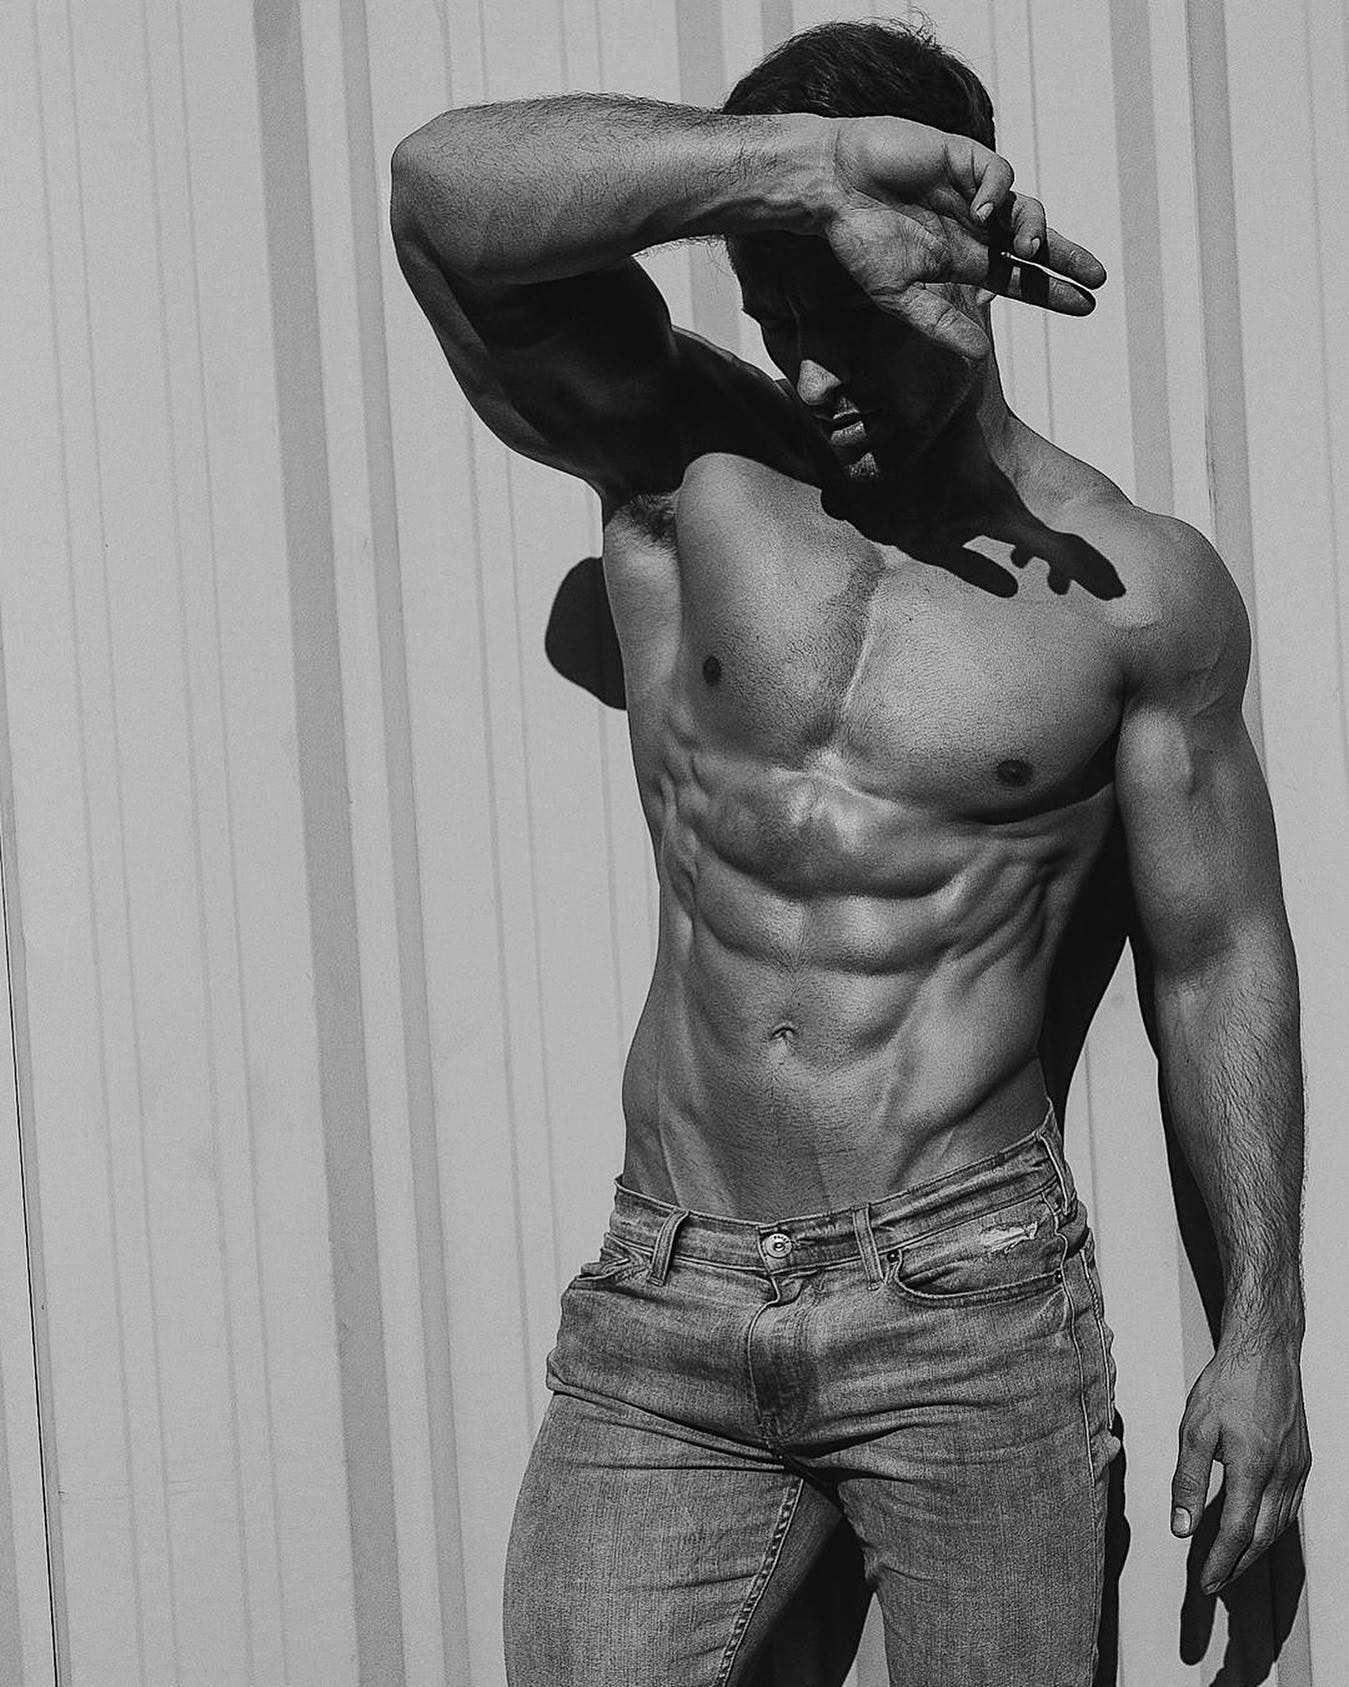 #men #jeans #abs #hunks #muscle #hotmen #blackandwhite